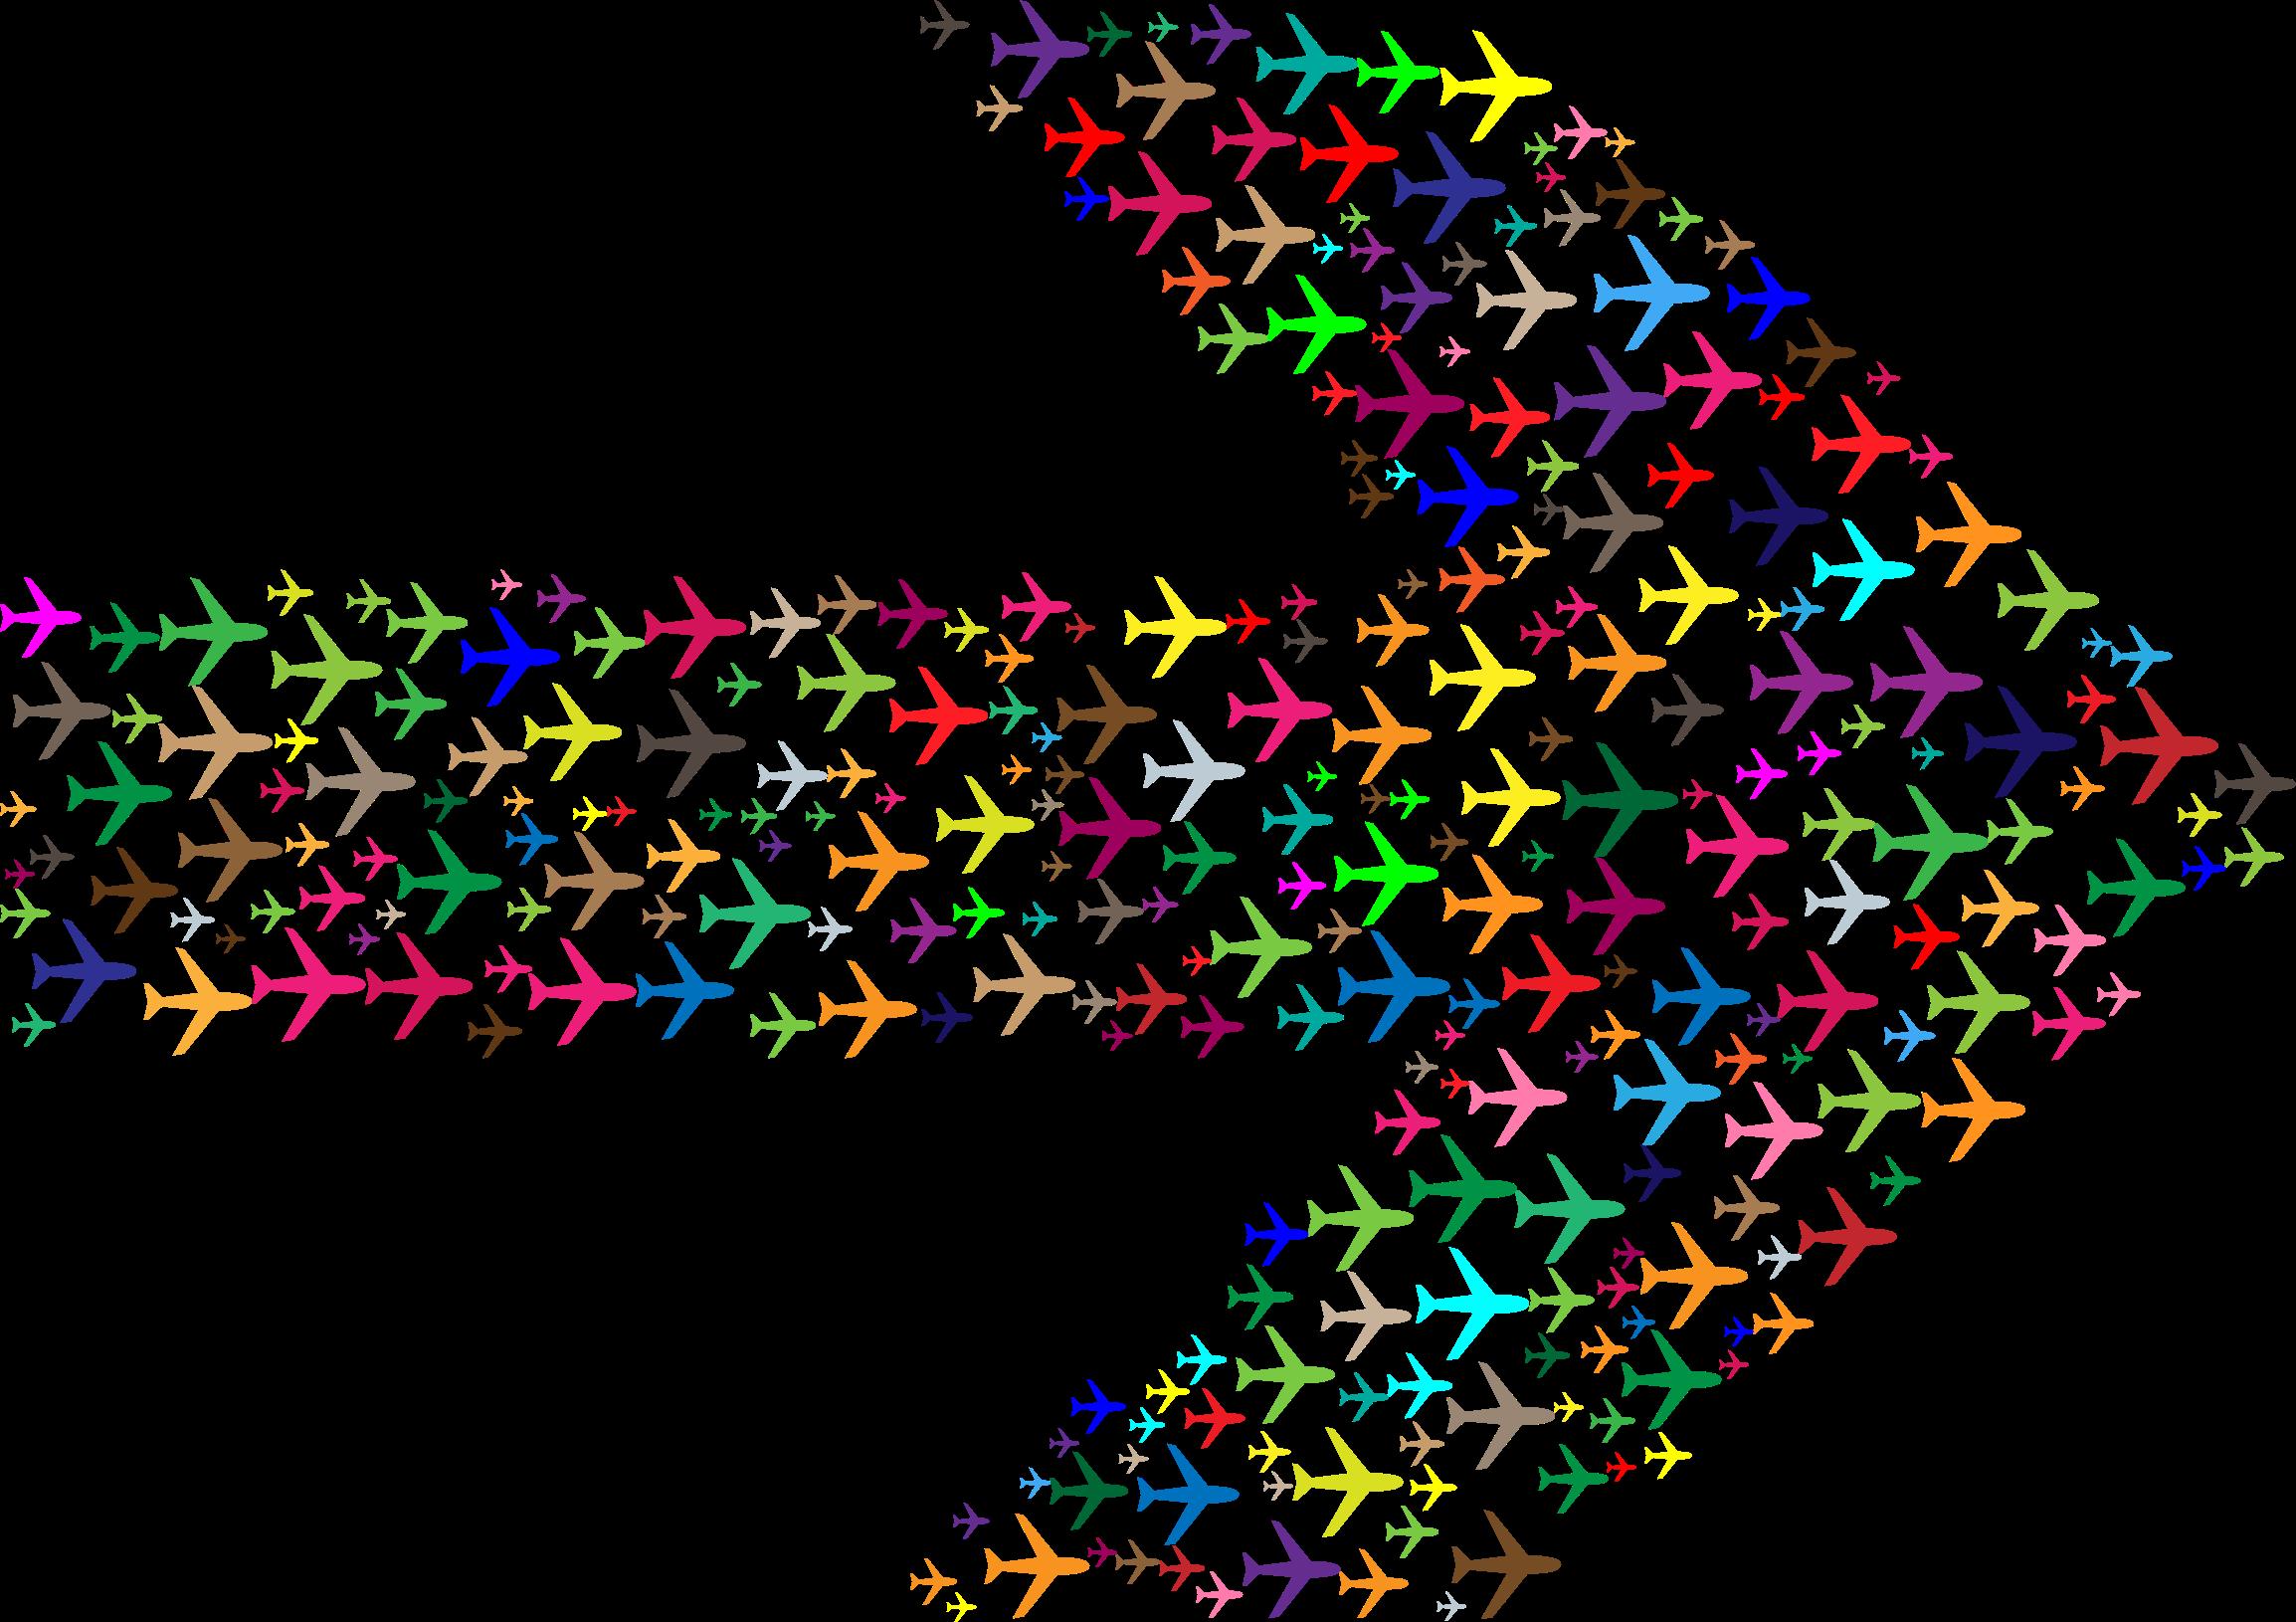 Clipart arrow colourful. Colorful planes big image